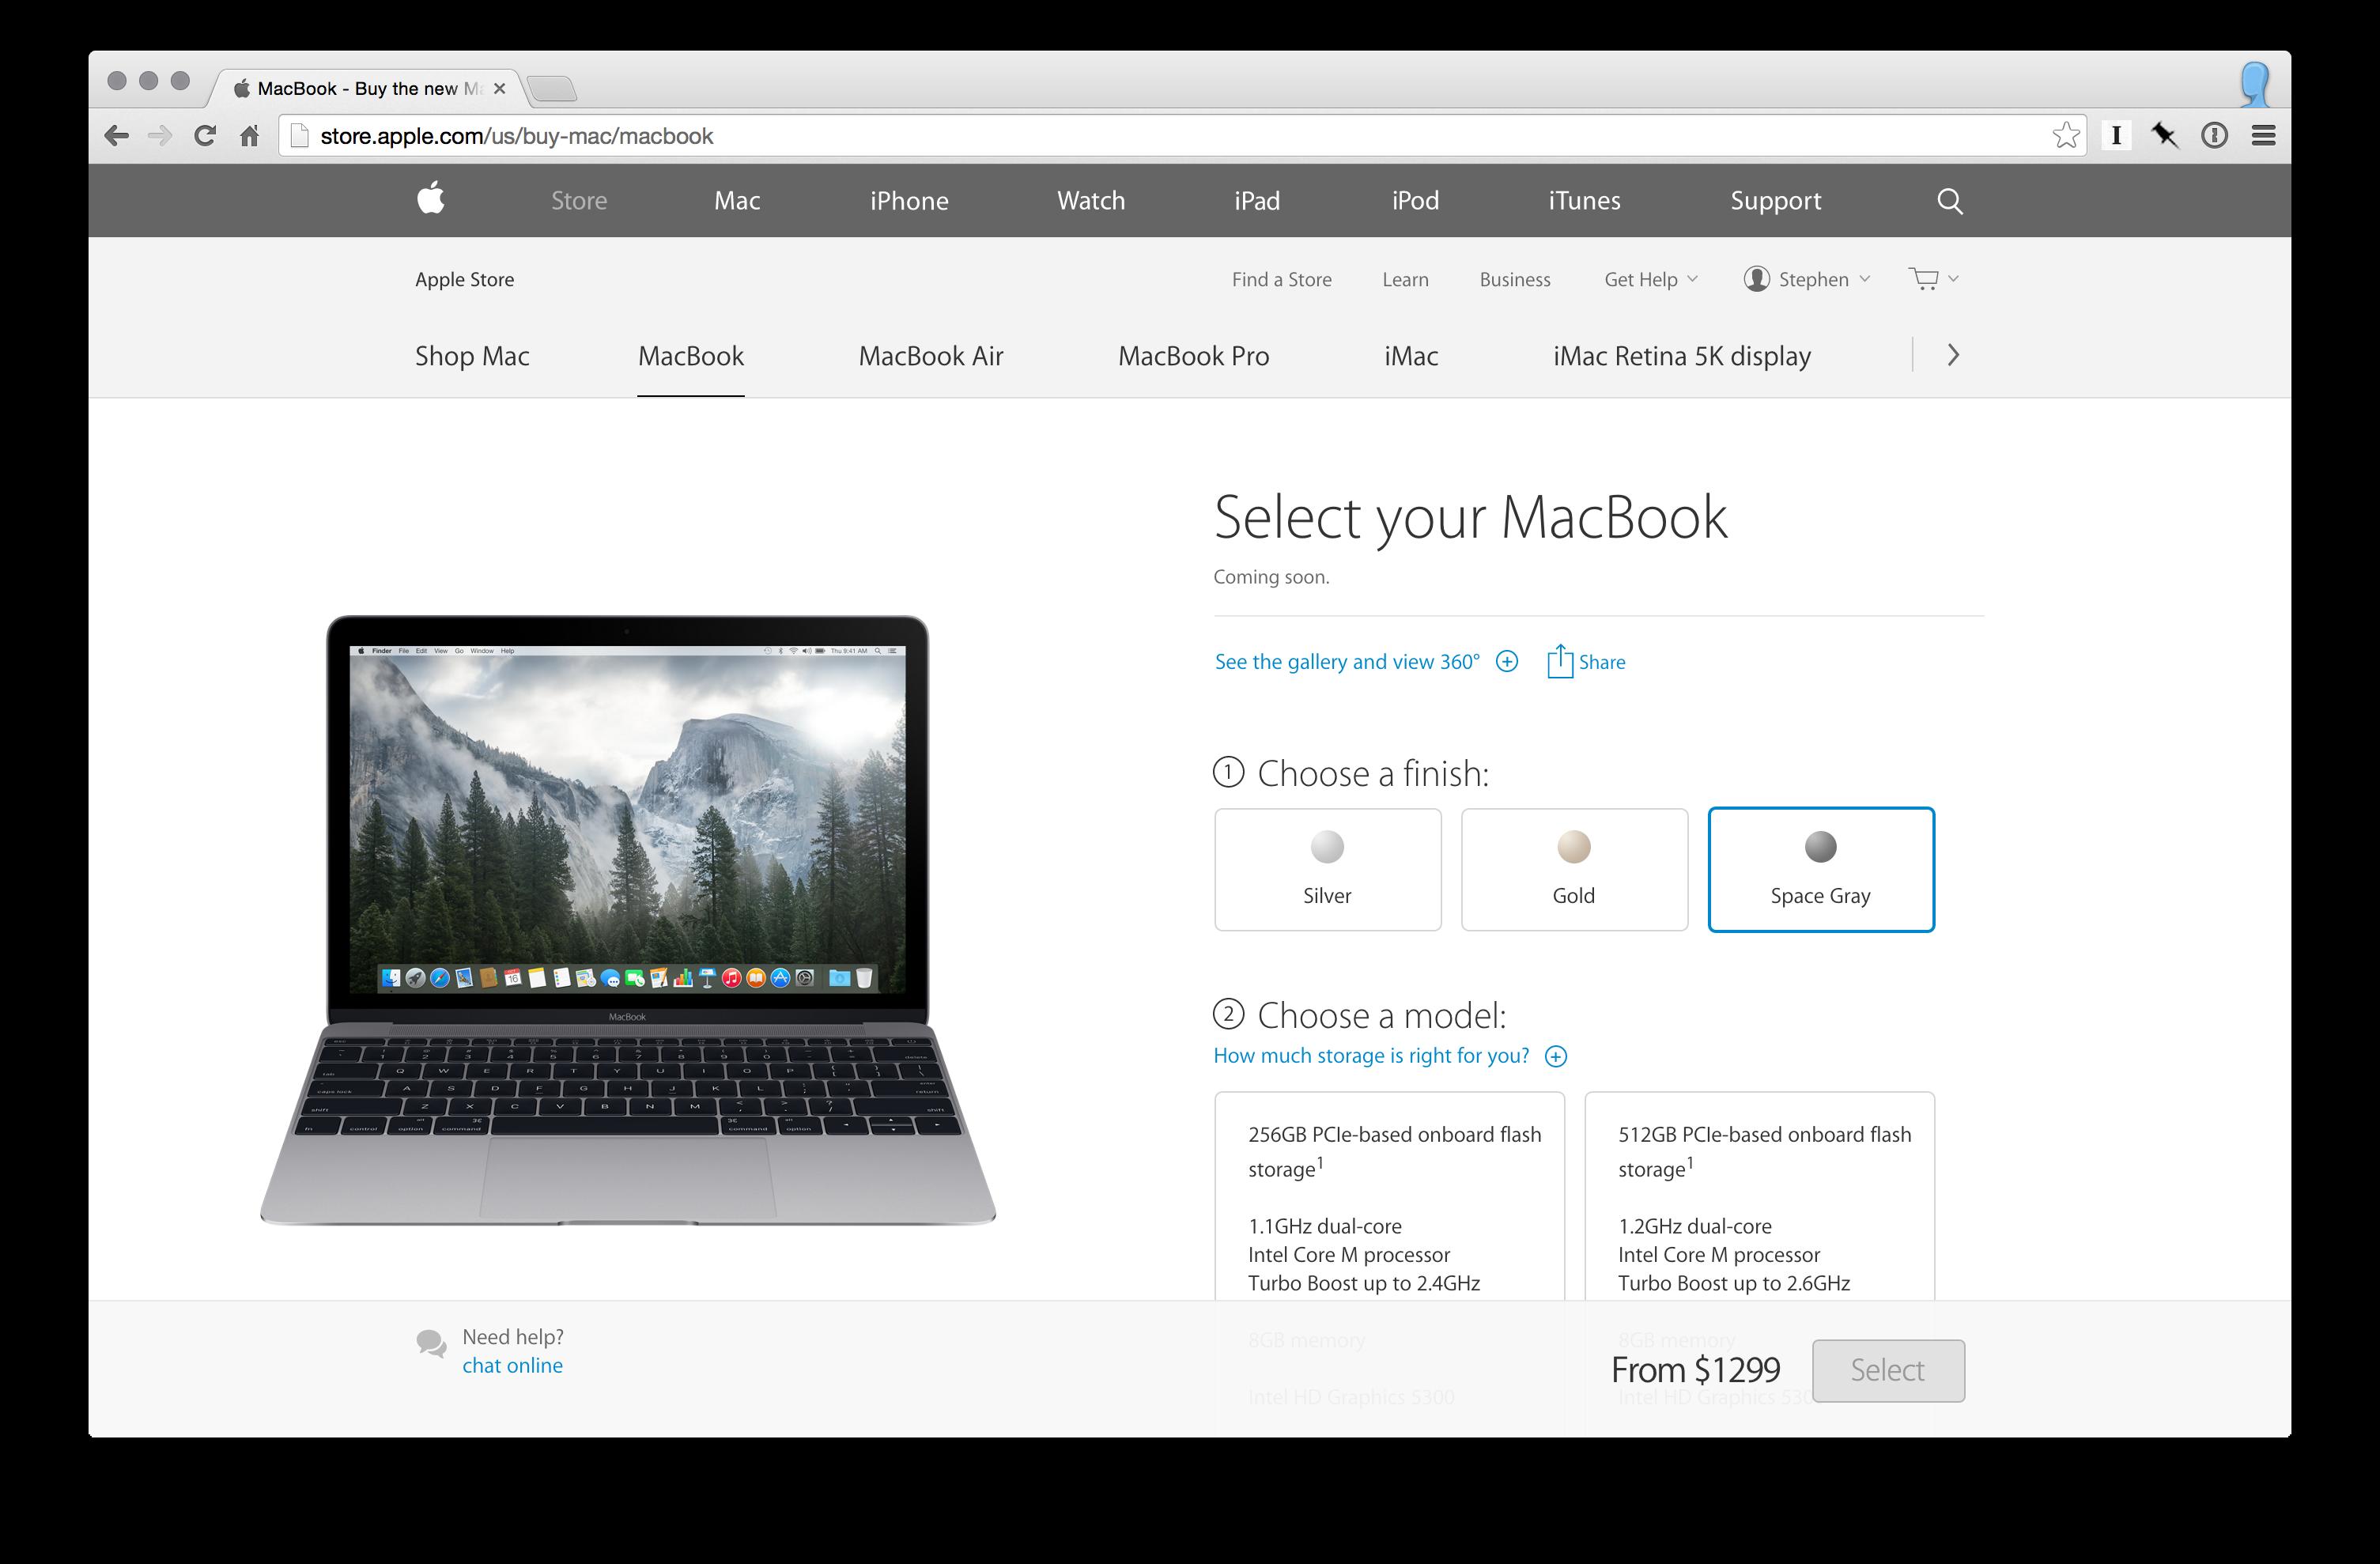 MacBook ordering